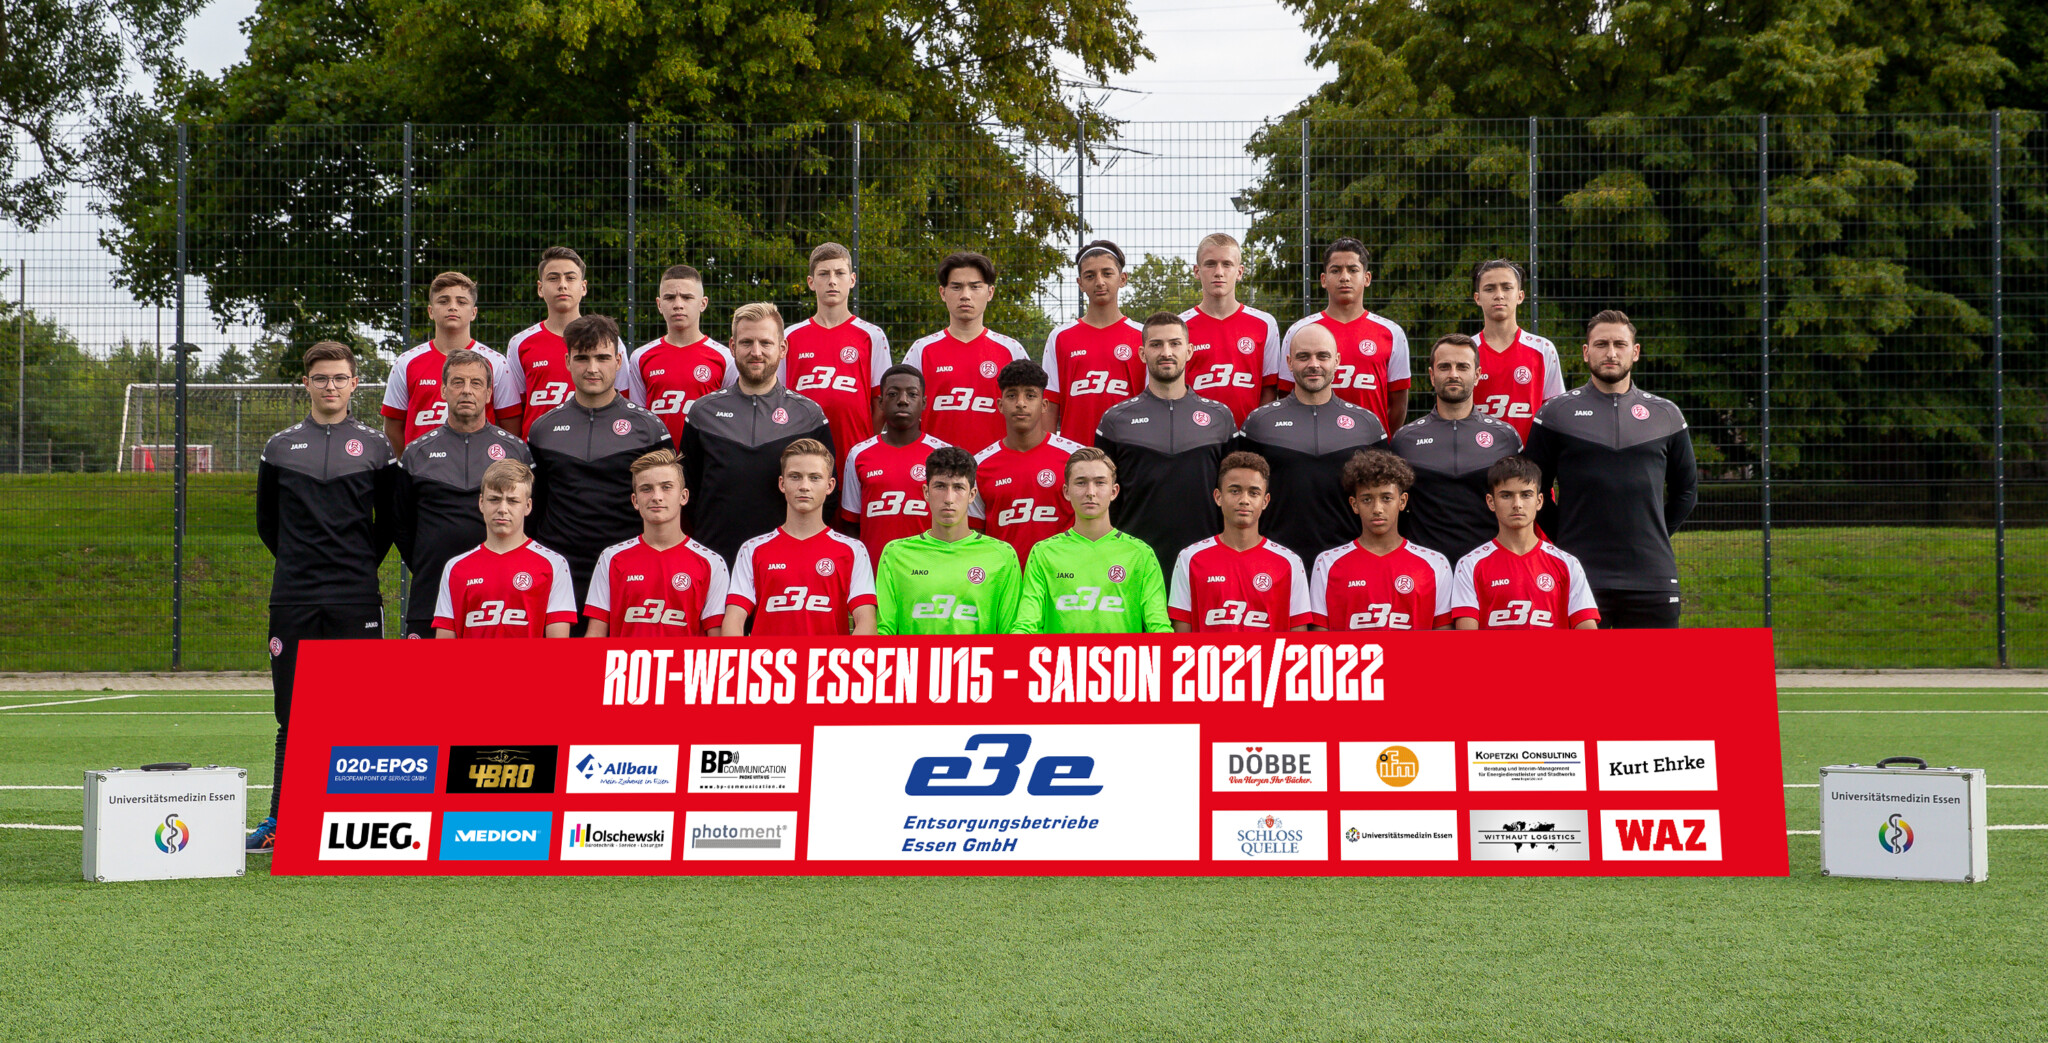 U15 – Rot-Weiss Essen